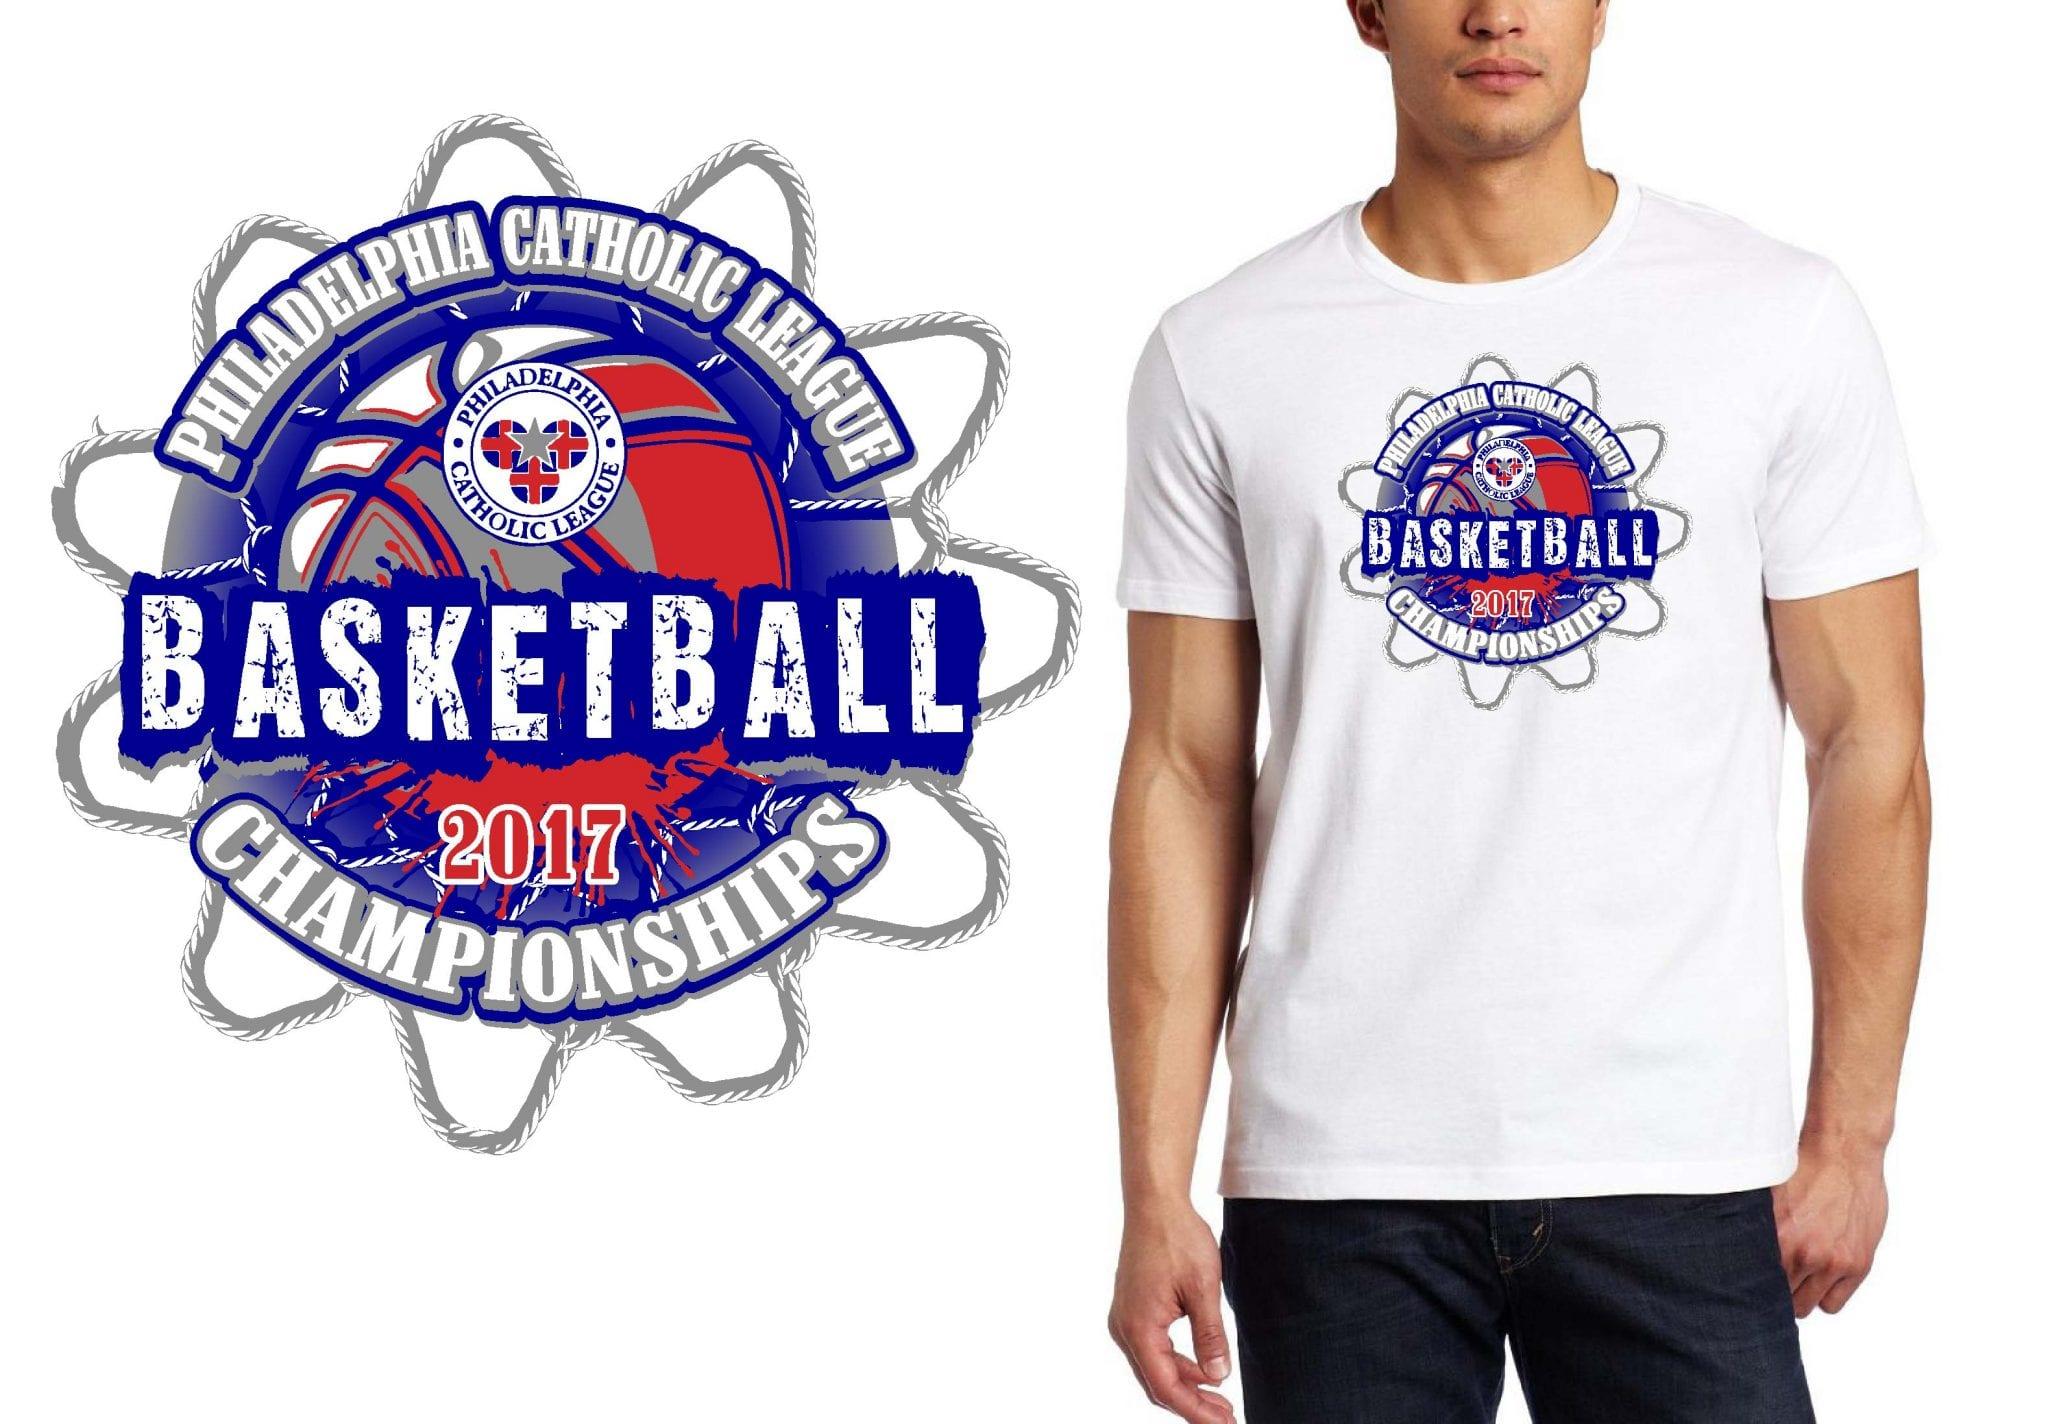 BASKETBALL TSHIRT LOGO DESIGN Philadelphia-Catholic UrArtStudio